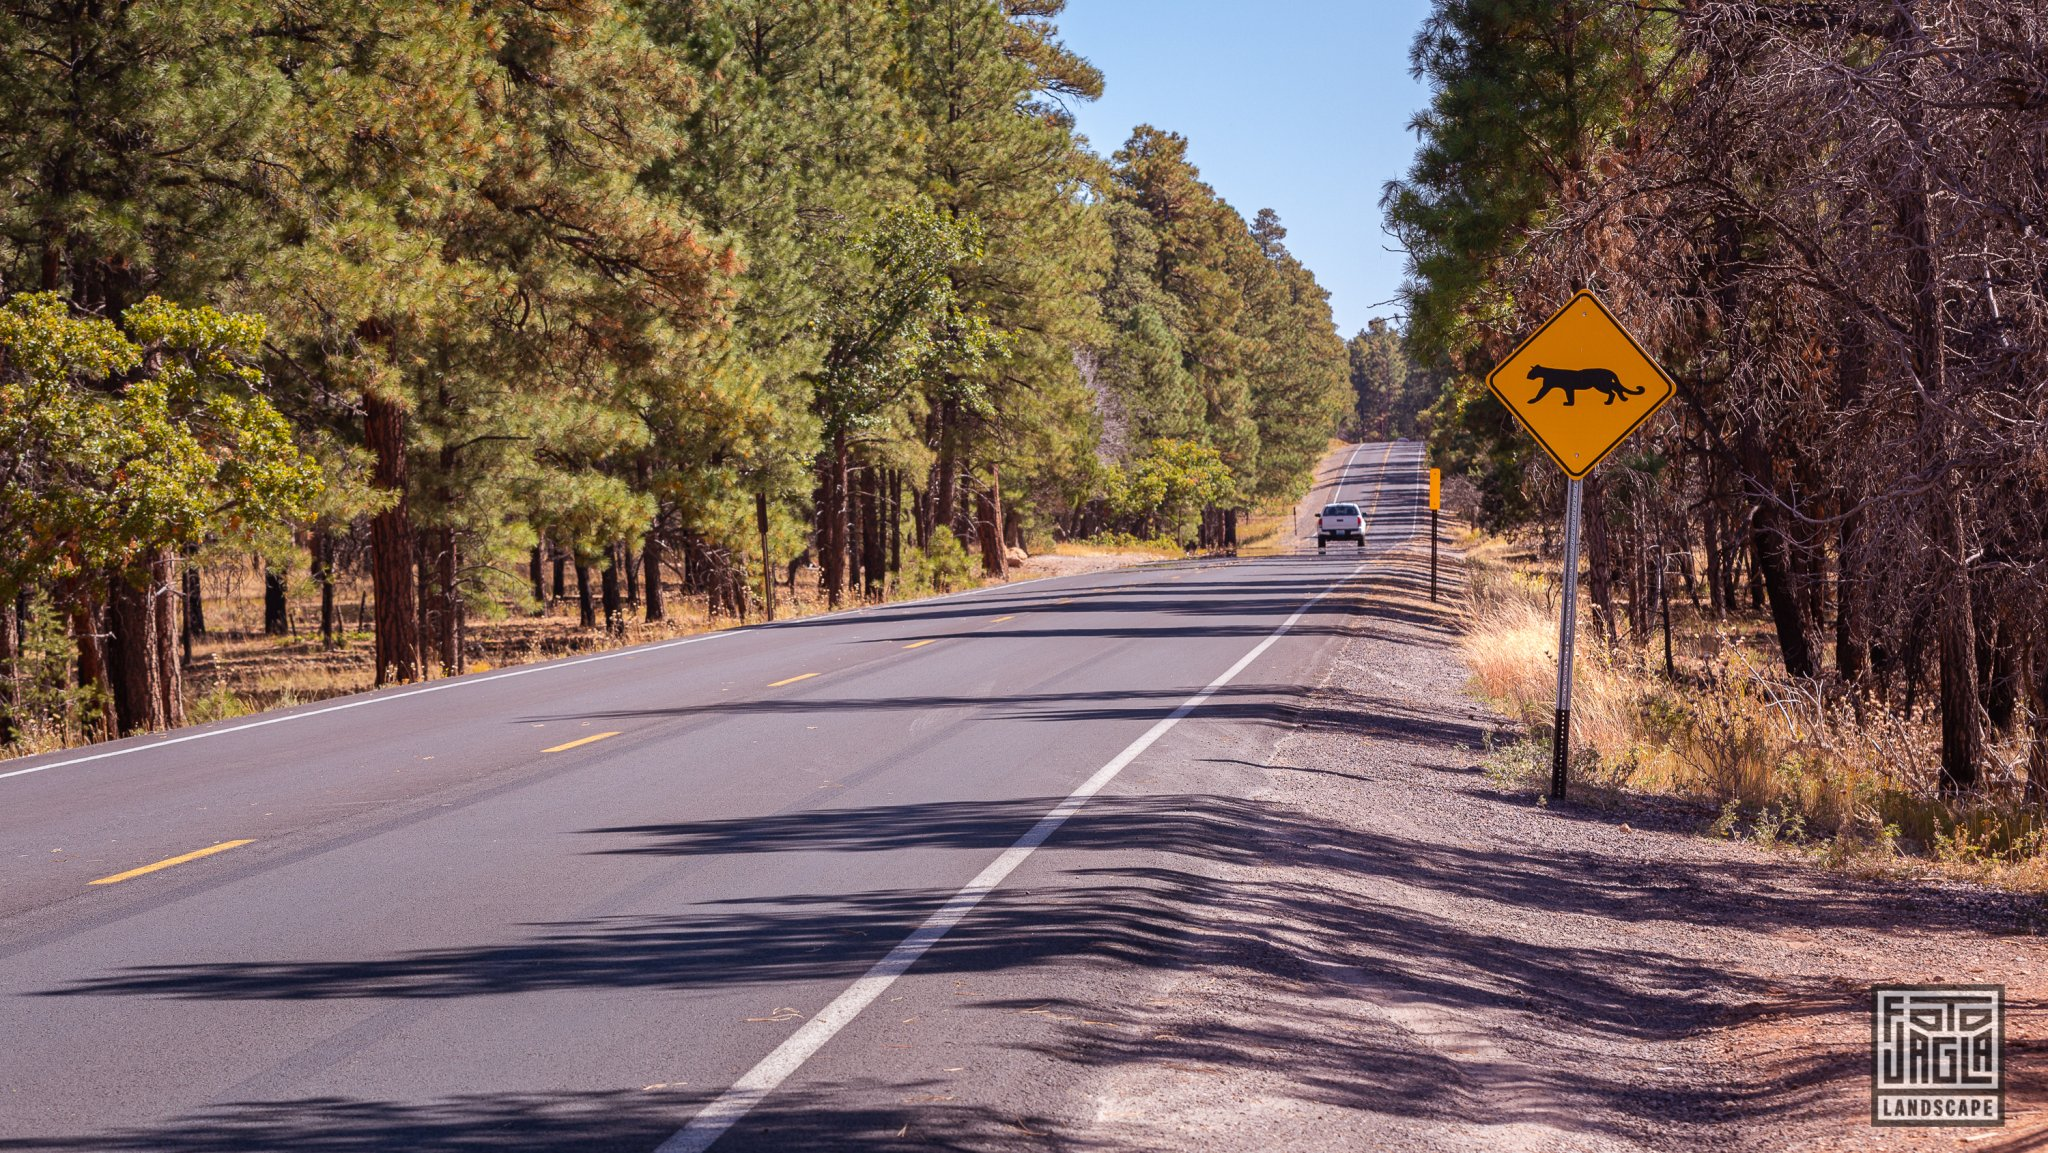 Desert View Drive in Grand Canyon Village Arizona, USA 2019